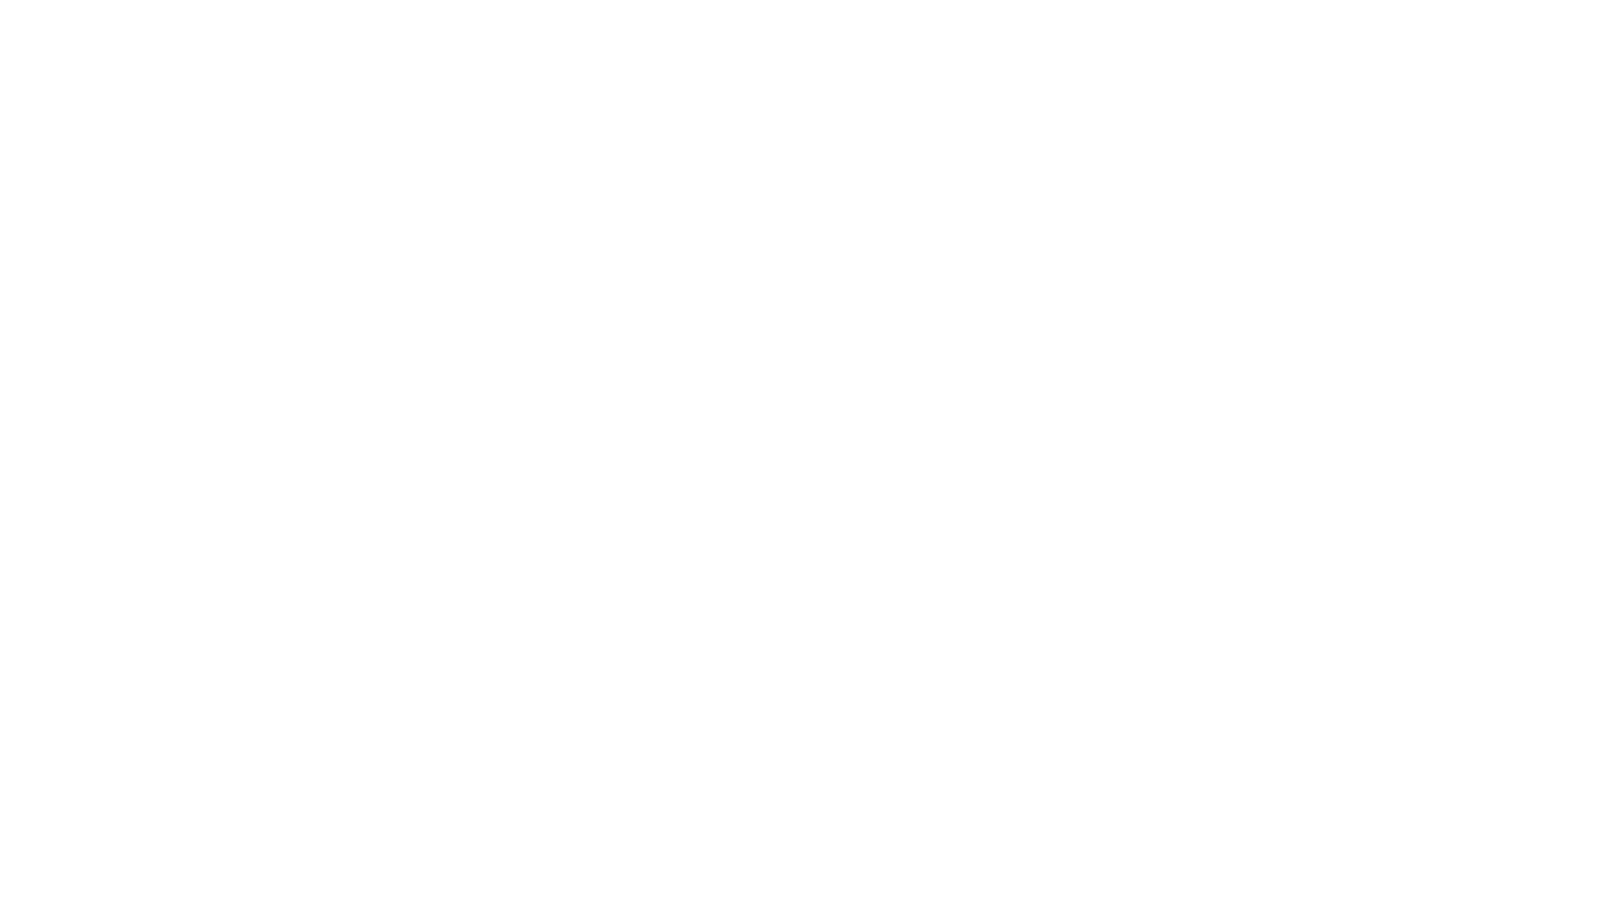 #bloculelectoralrenatousatii #блокренатоусатый  Официальный сайт  -  https://ru1.md/ Facebook https://www.facebook.com/RU1.md Группа в Одноклассниках – https://ok.ru/novayapartia YouTube         https://www.youtube.com/user/renatousatii Группа в Контакте  –   http://vk.com/id133988172   Googe+         https://plus.google.com/+renatousatii/posts